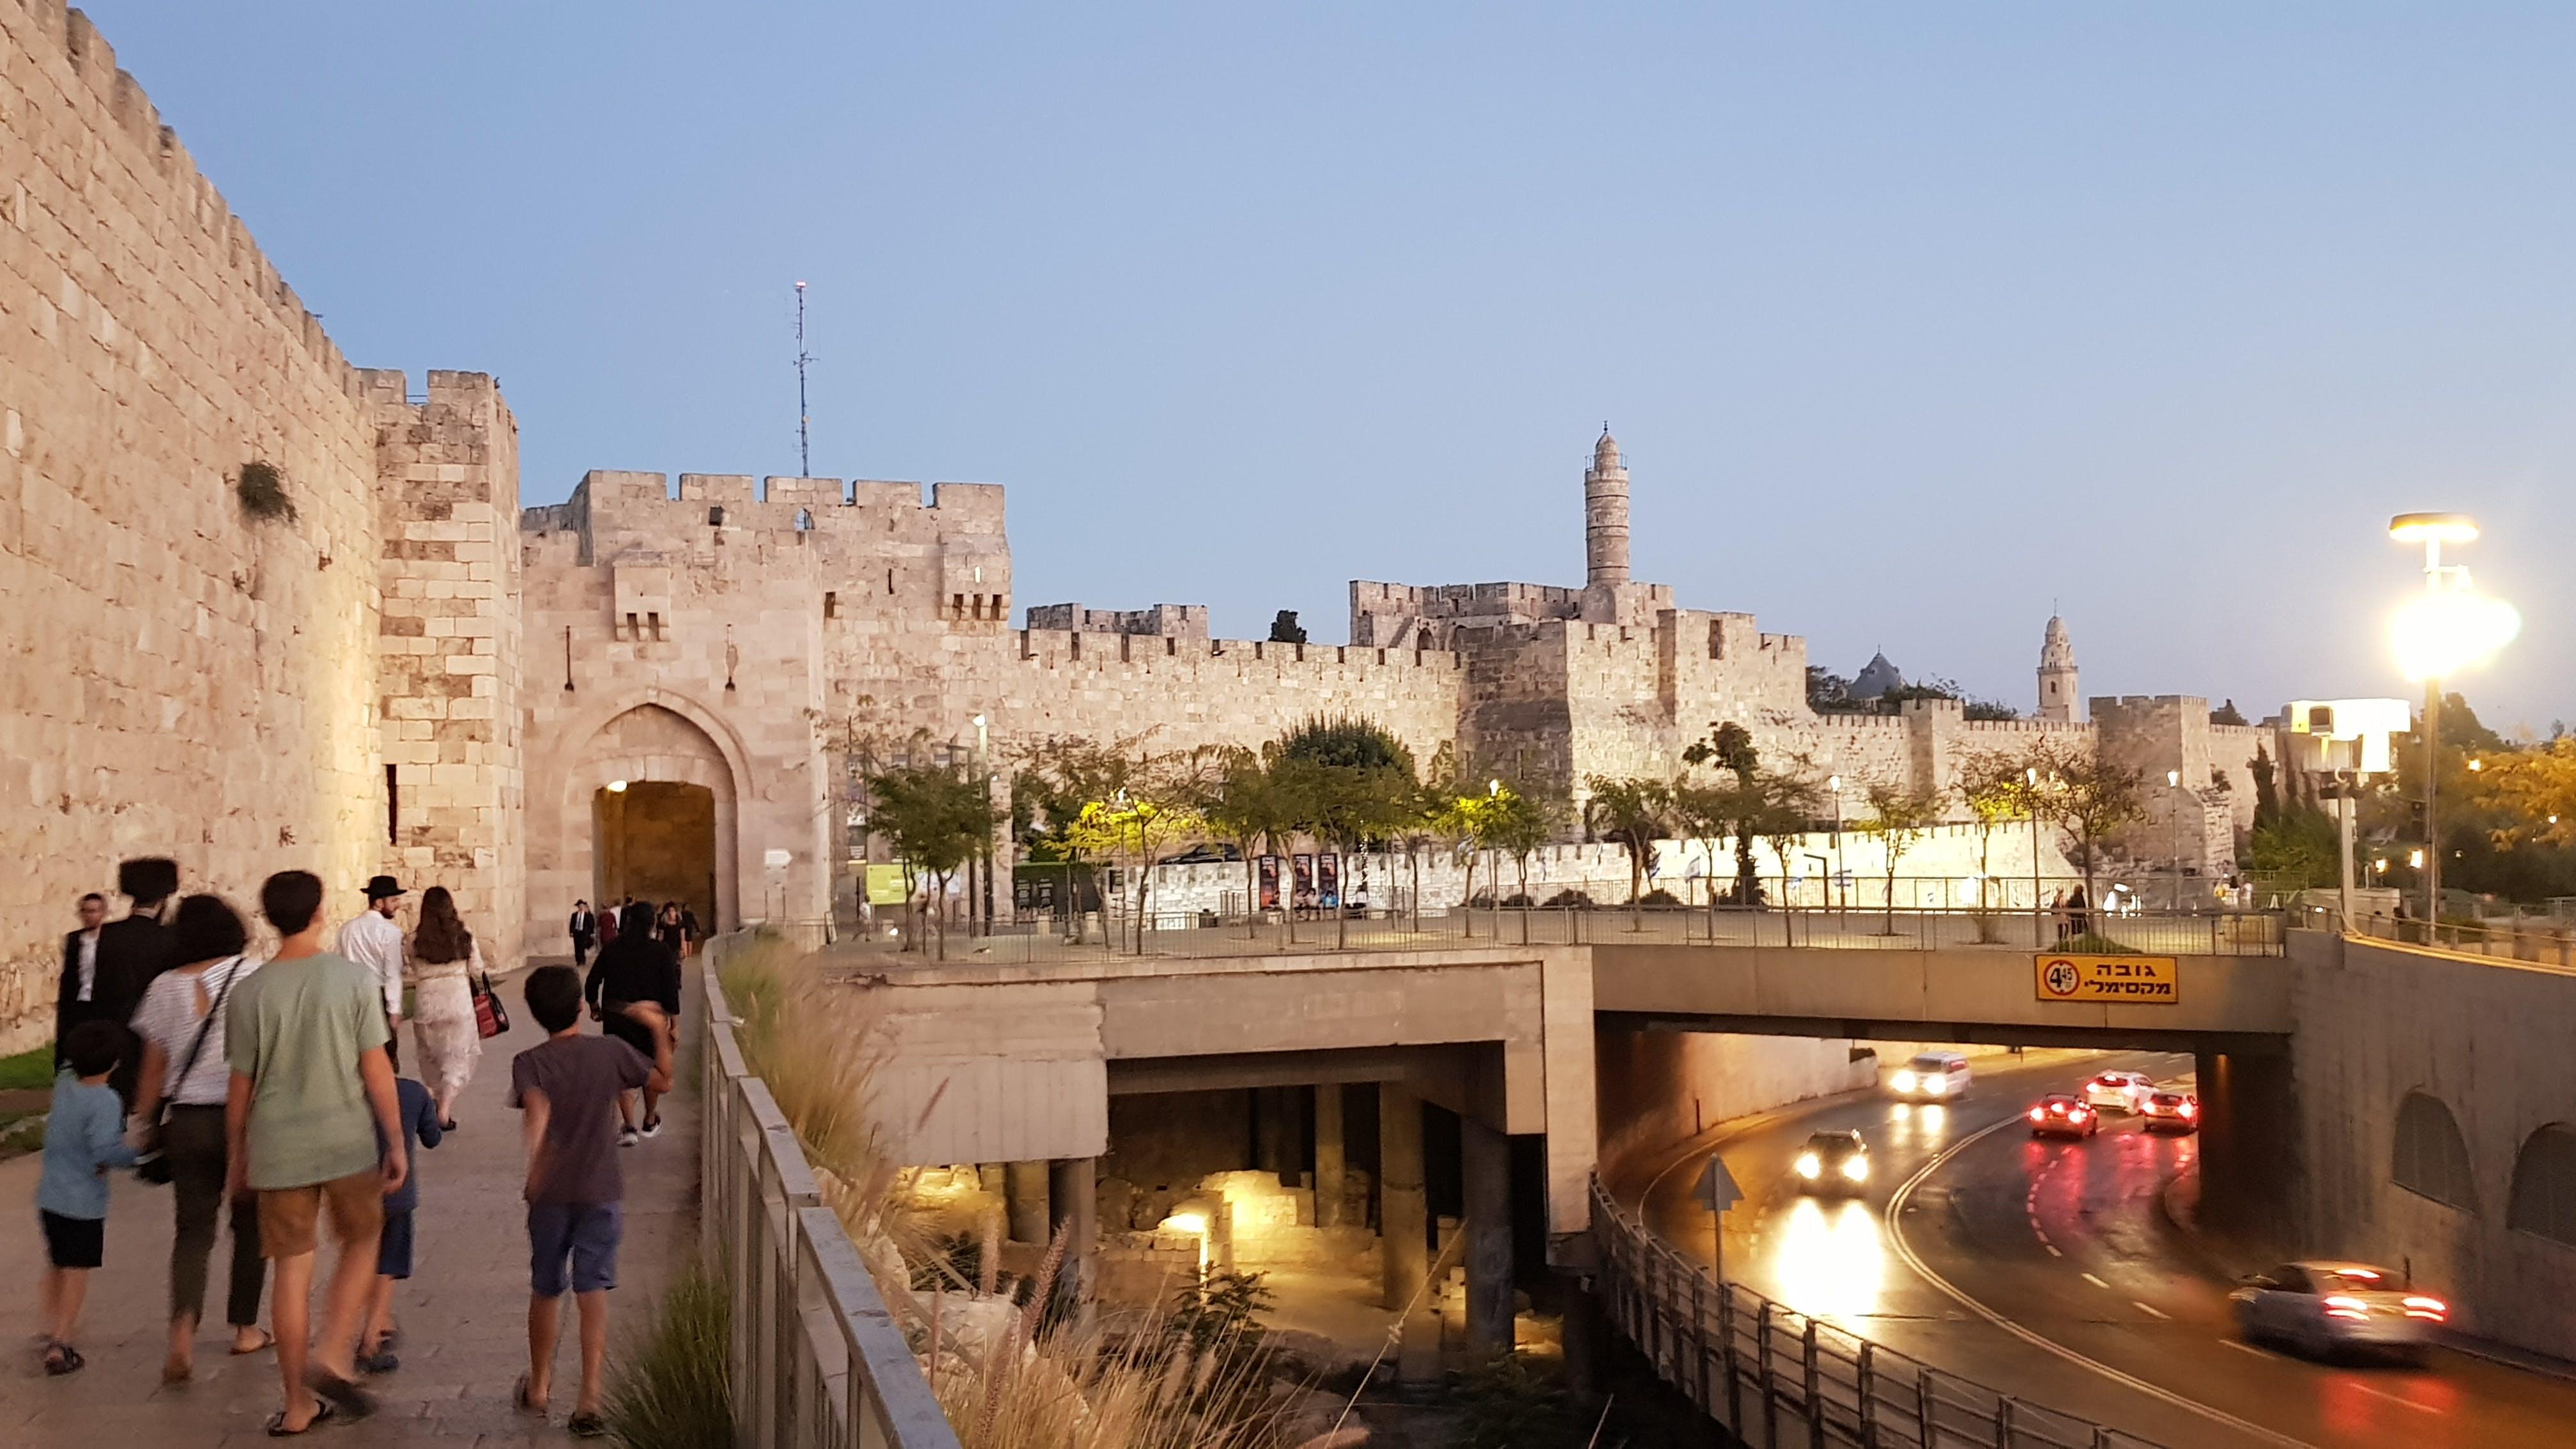 Free stock photo of jerusalem, old city, tower of david, walls